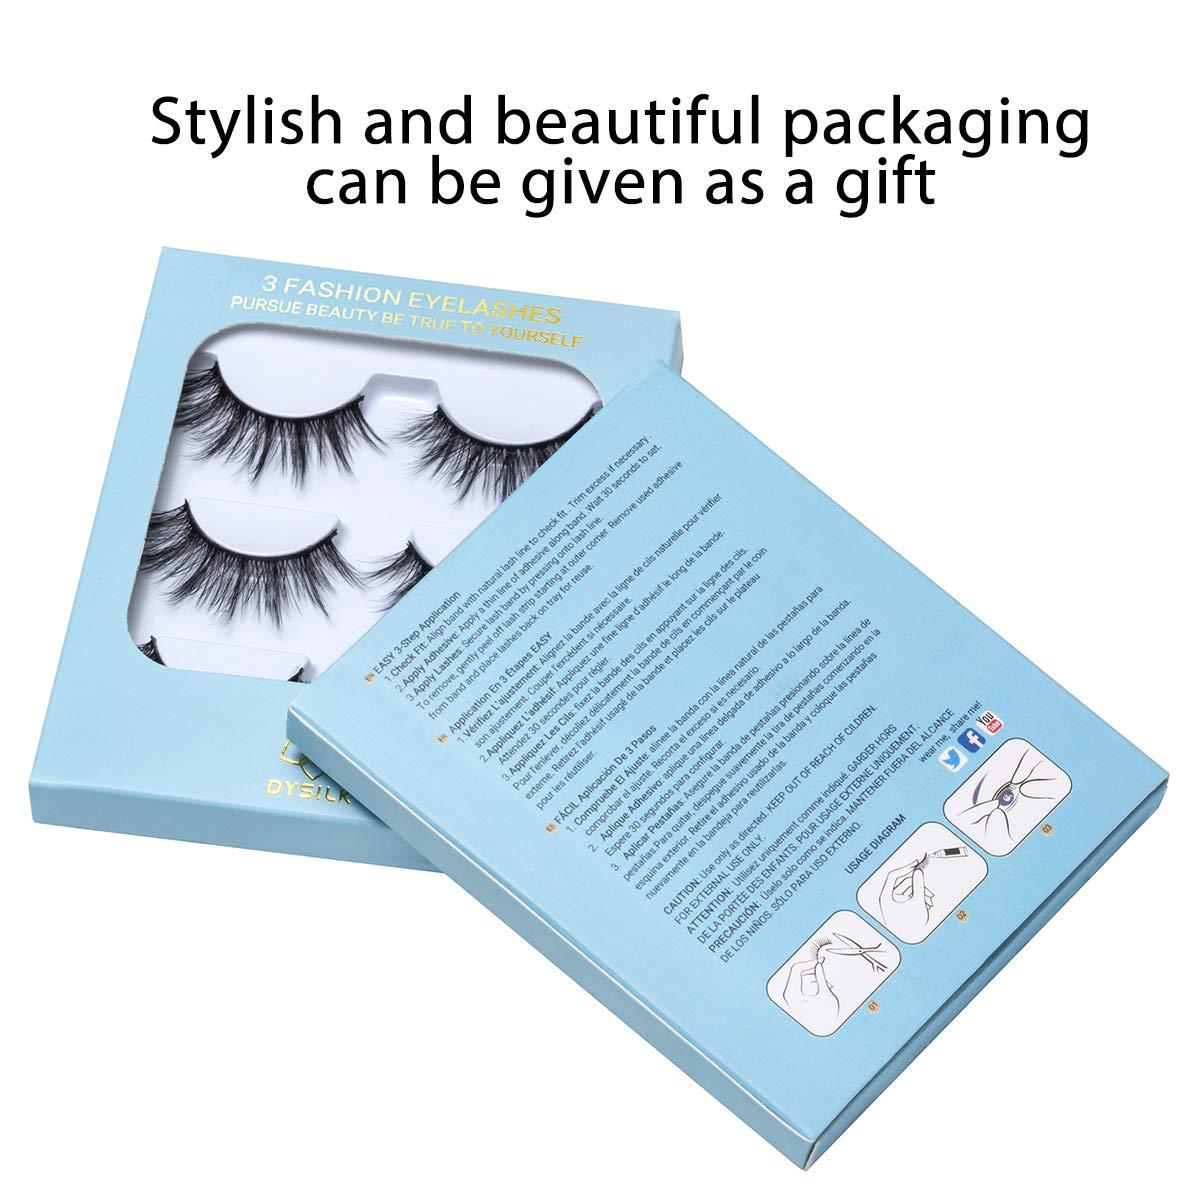 DYSILK 3D Eyelashes Mink Natural Look False Eyelashes Wispy Extension Makeup Long Handmade Fake Eyelashes Fluffy Soft Reusable Black 3 Pairs